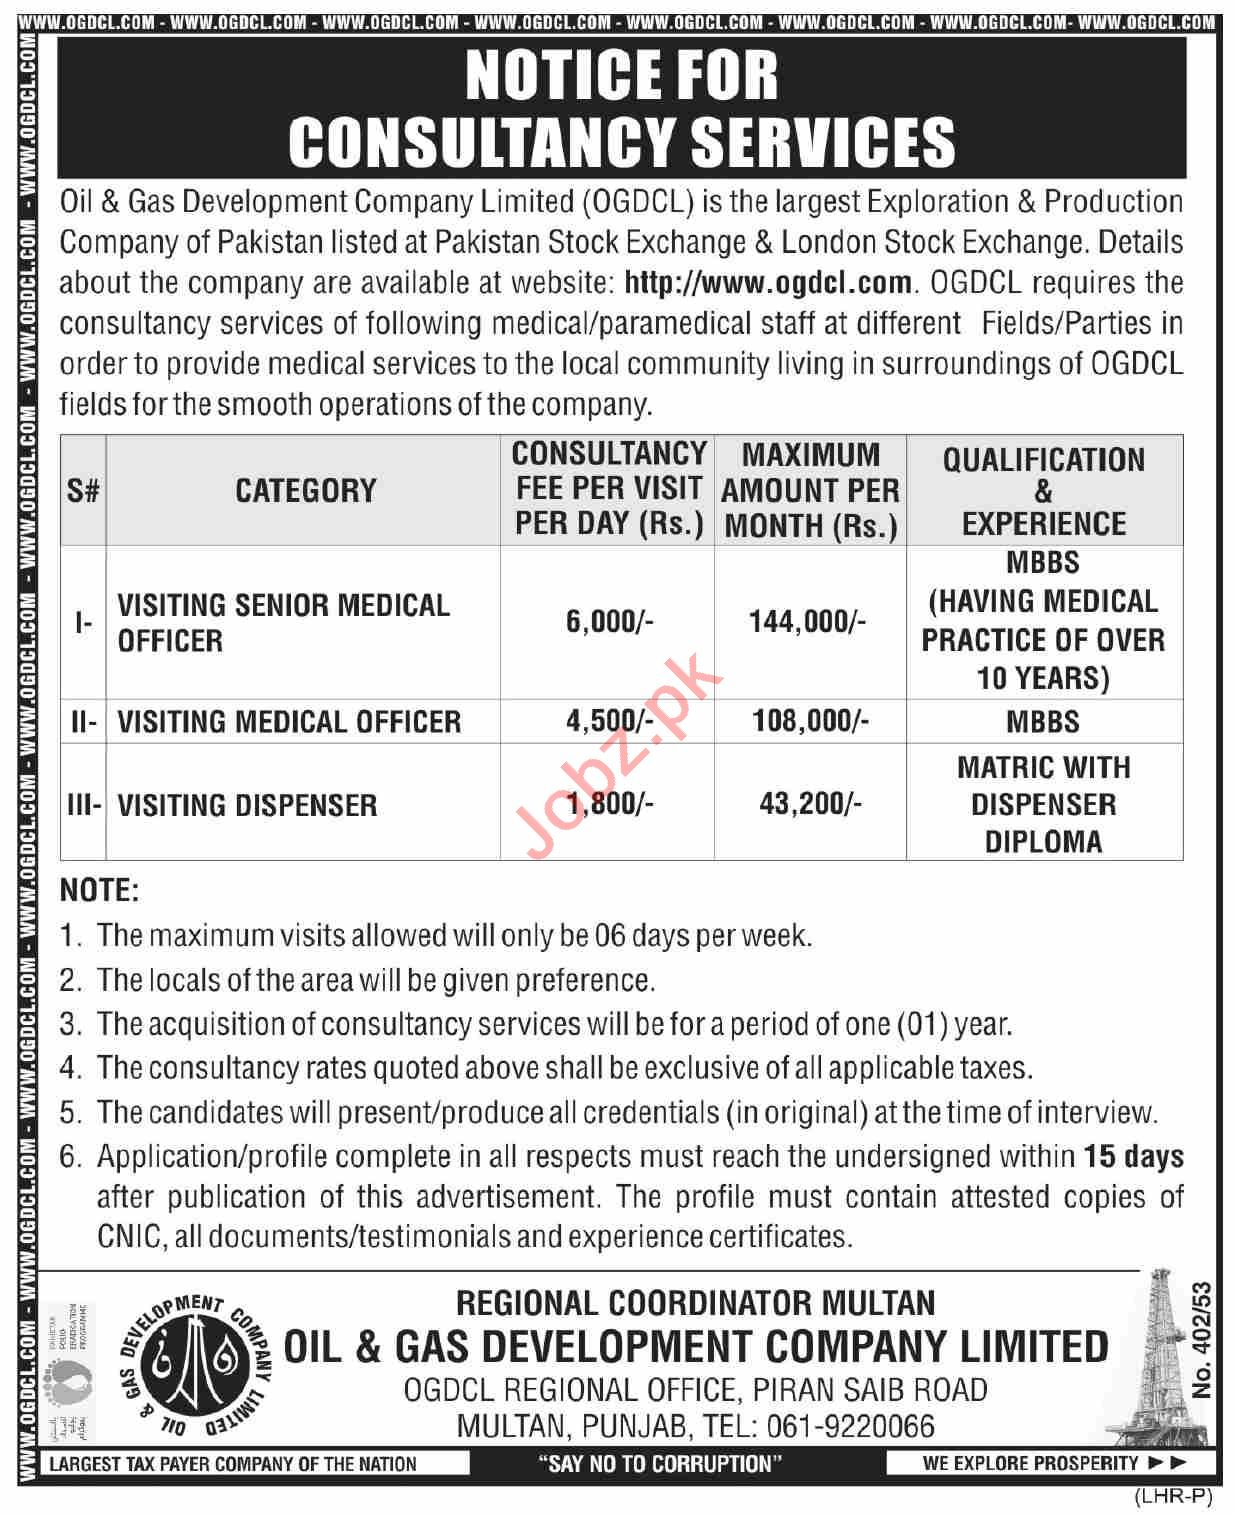 OGDCL Regional Office Multan Jobs 2021 for Medical Officers